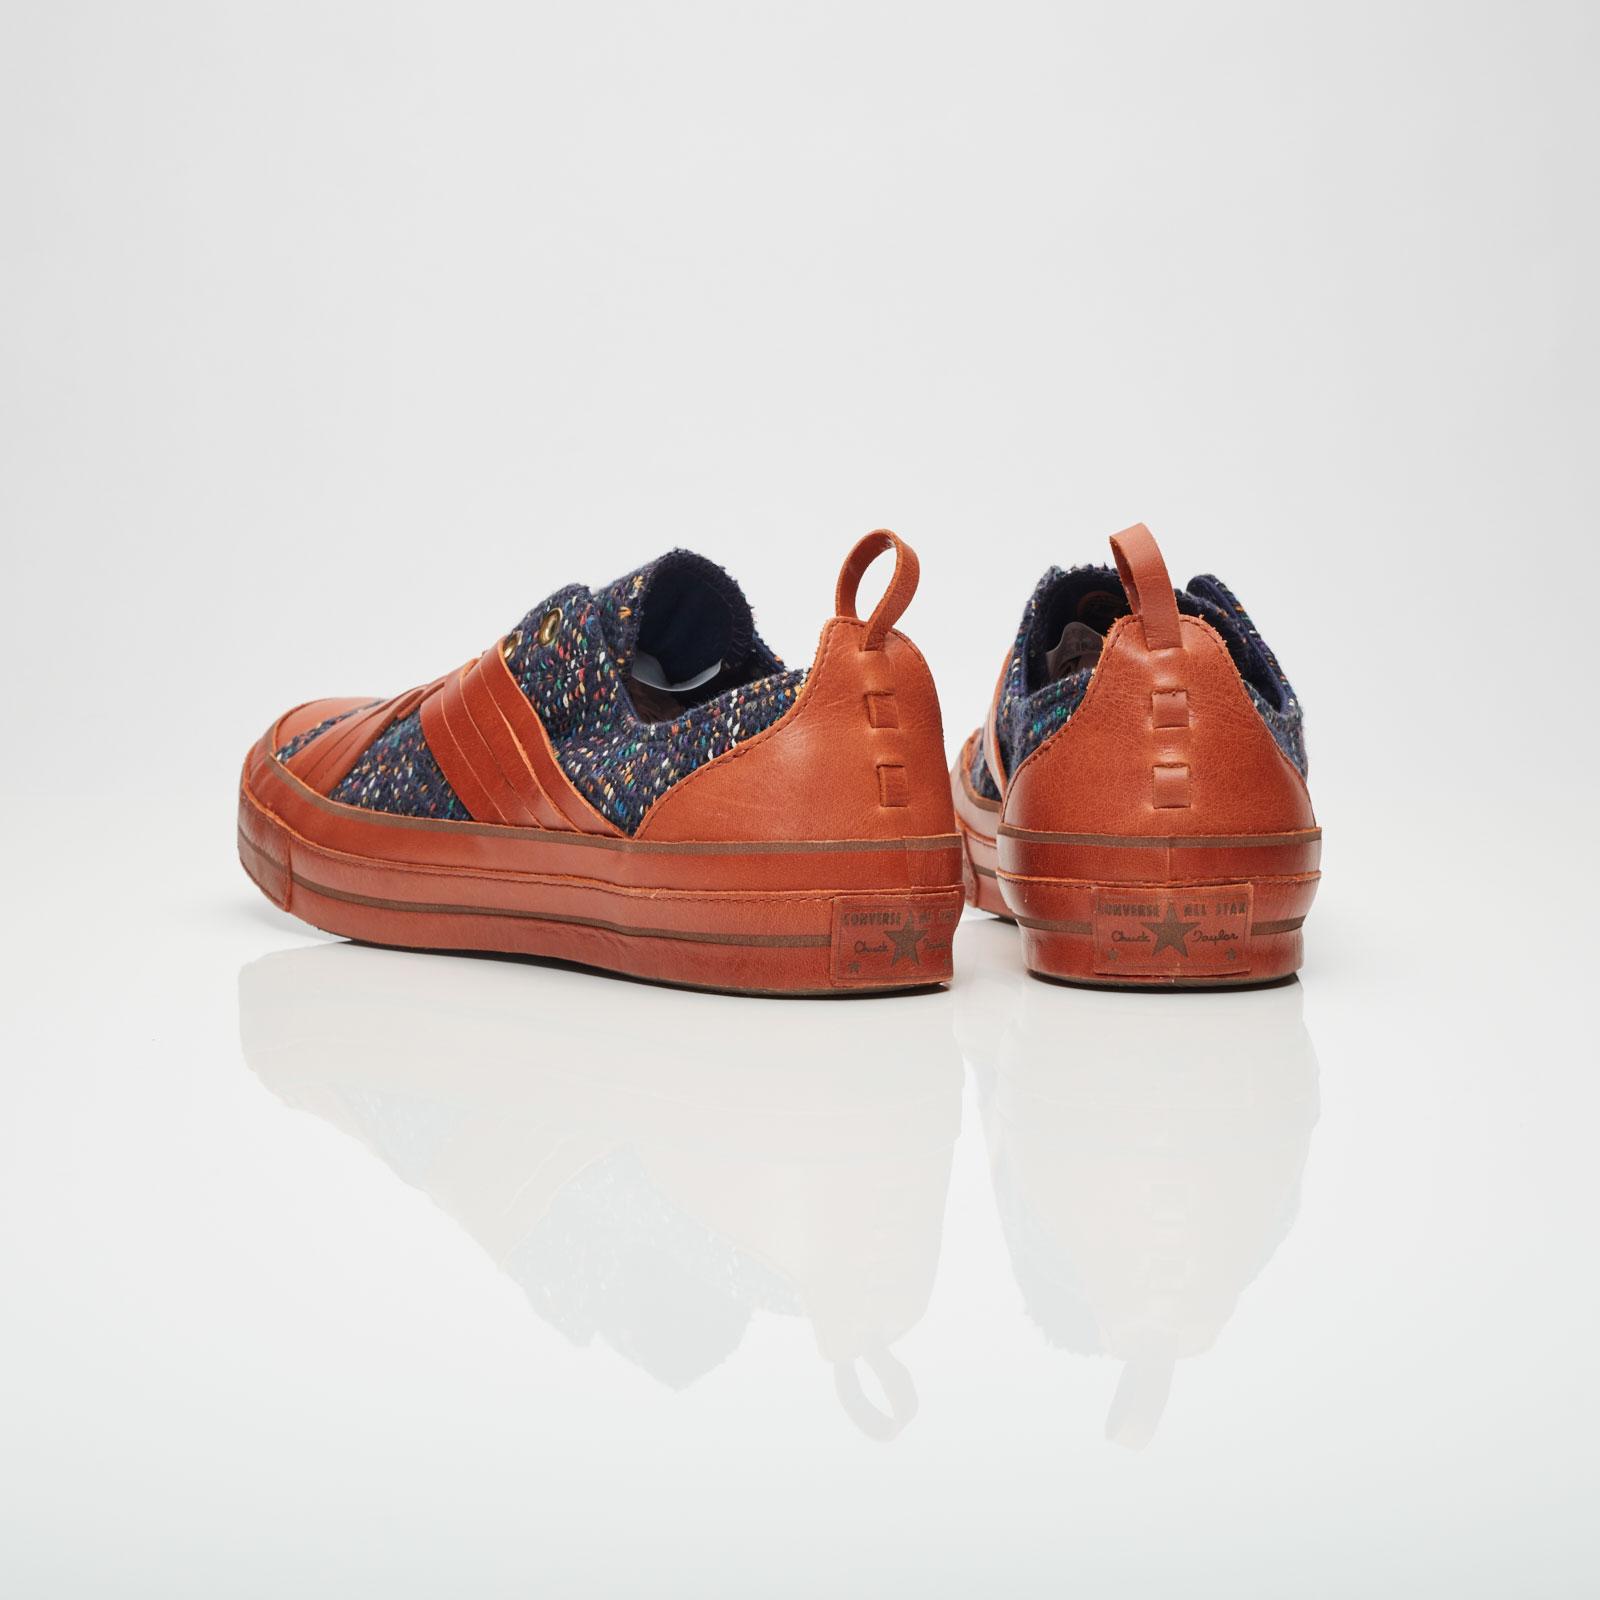 81eb86c21d19 Converse Chuck 70s Slip x Missoni - 157259c - Sneakersnstuff ...